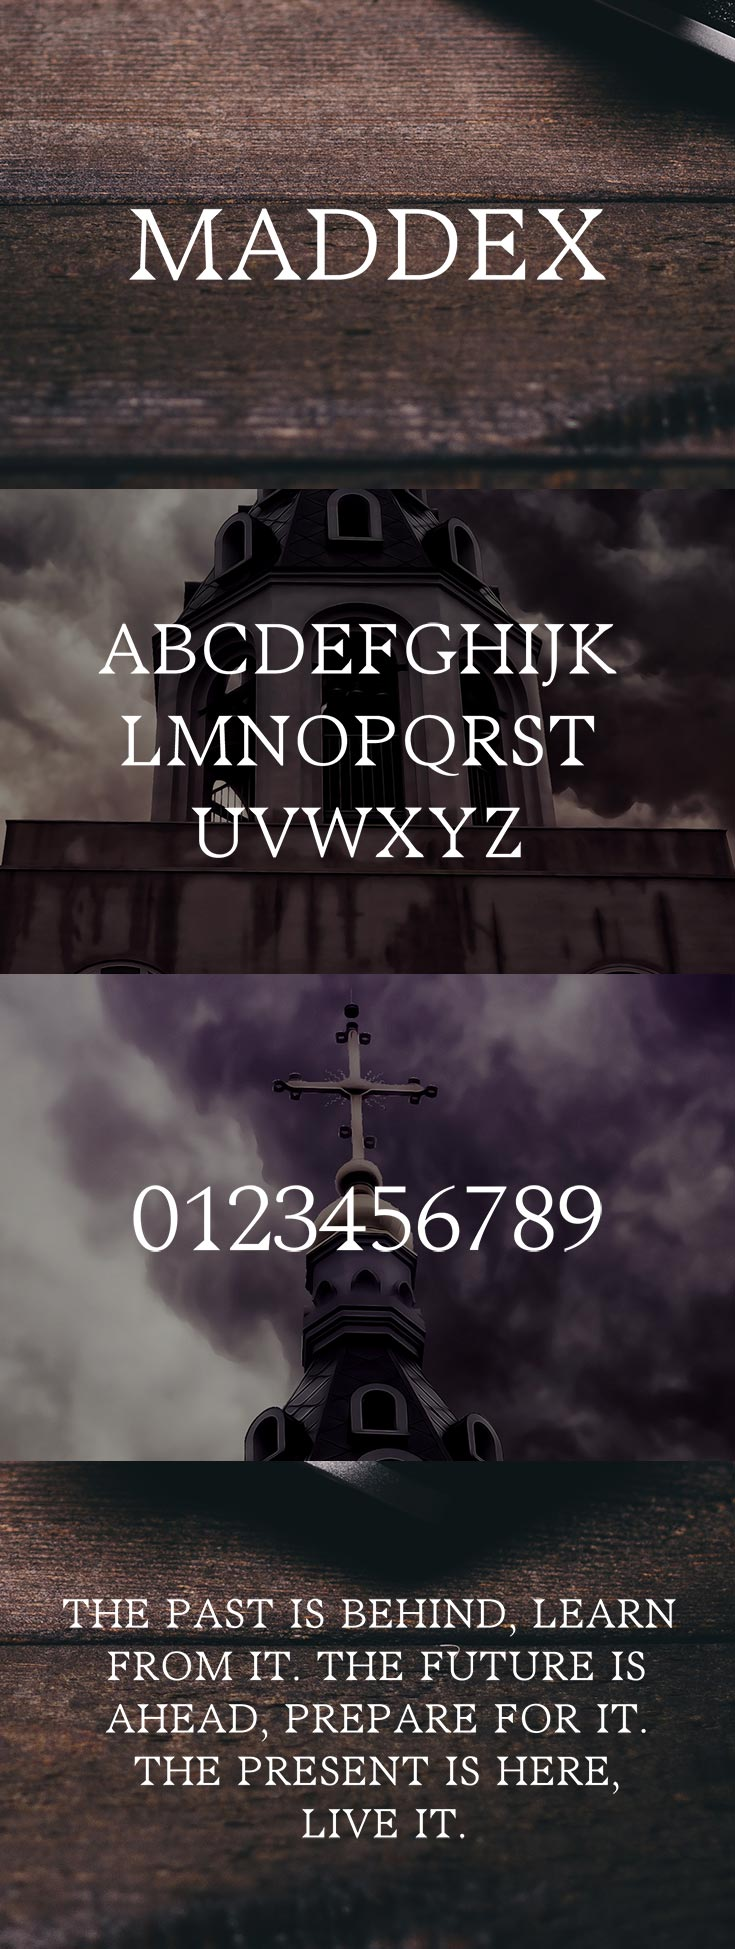 Free Maddex Serif Font